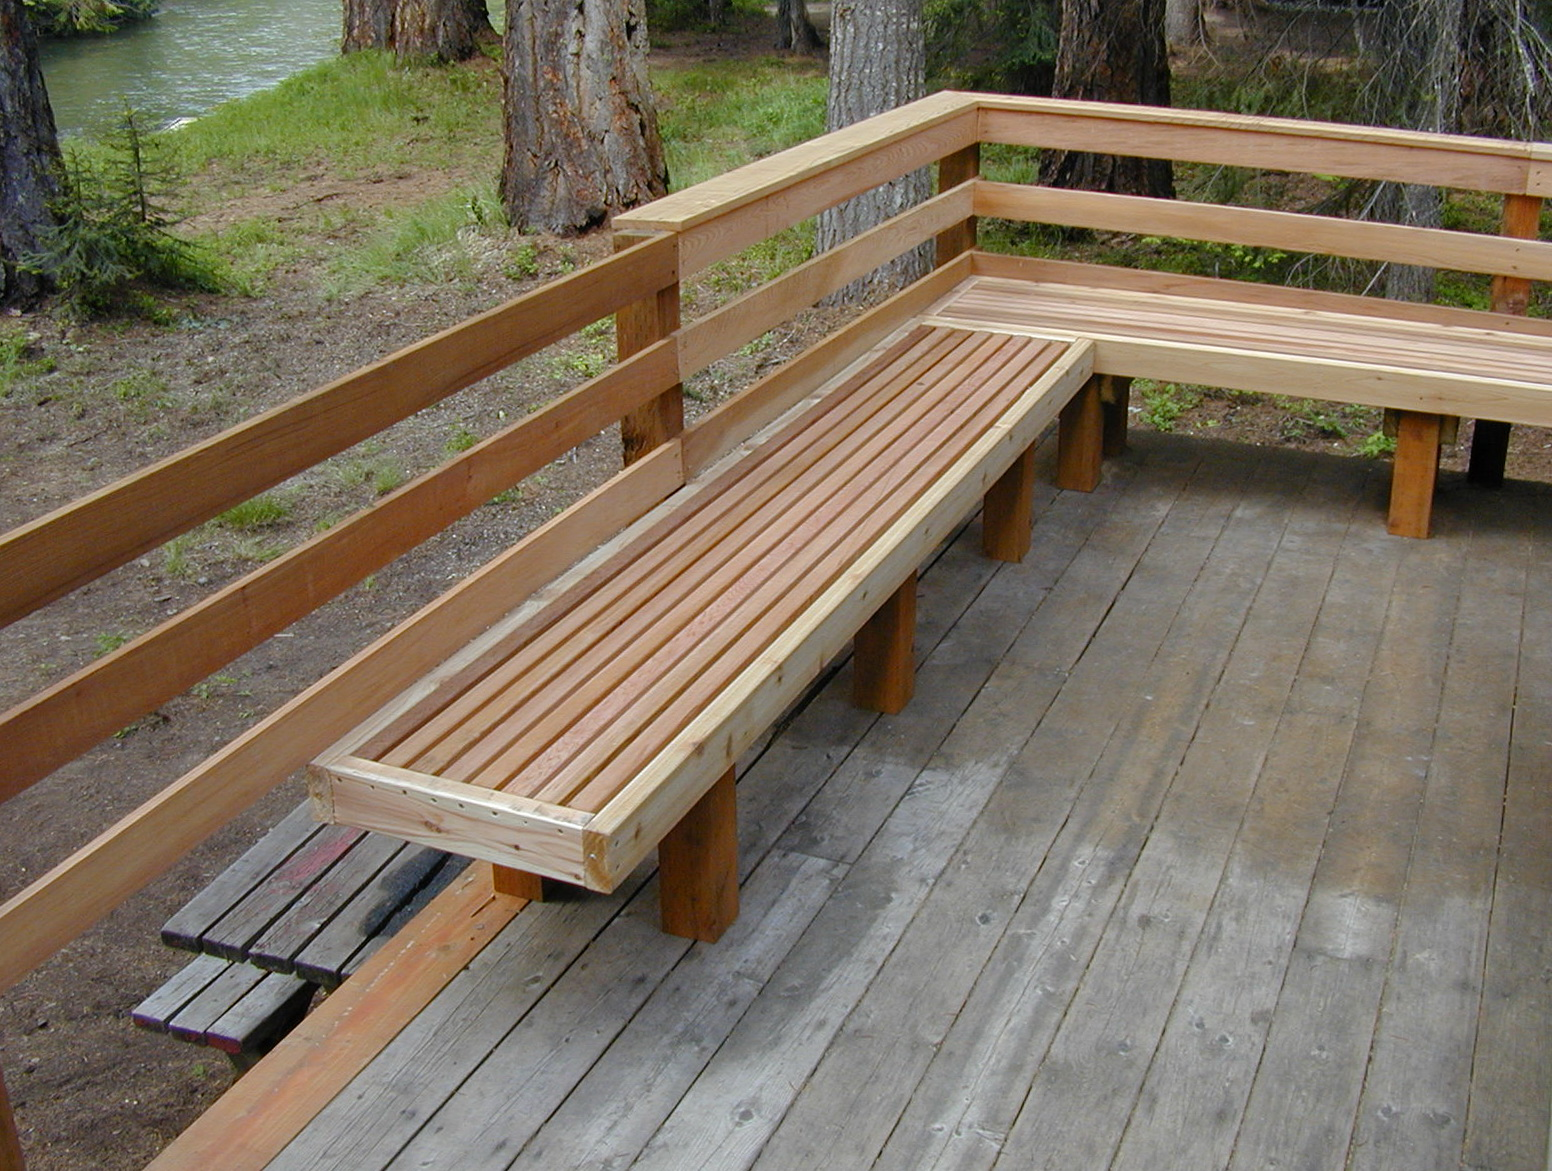 Bench Design Ideas Part - 44: Deck Bench Design Ideas